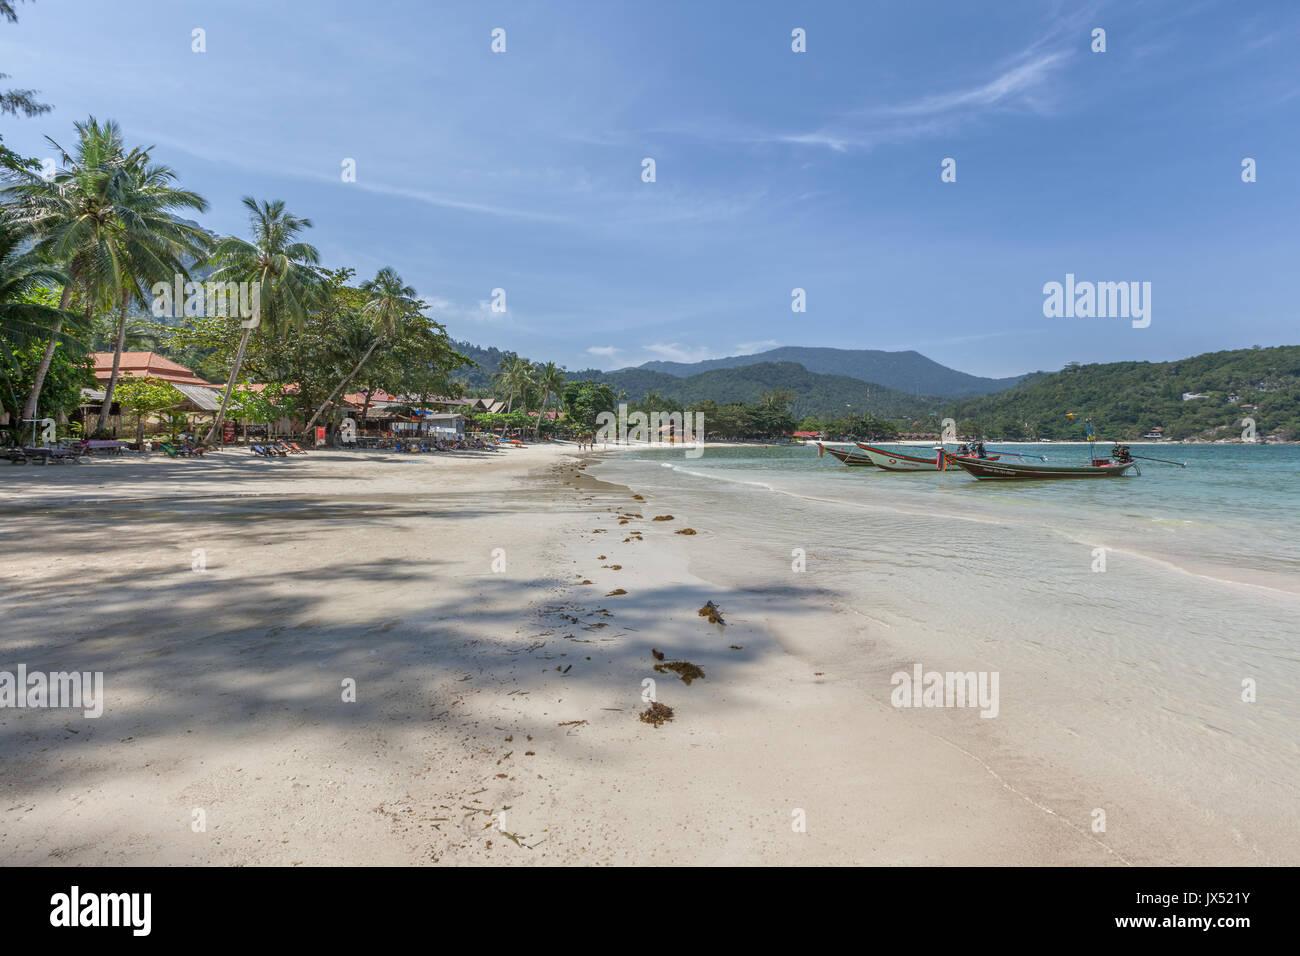 Ao Thong Nai Pan Noi Beach, Koh Phangan island, Thailand - Stock Image